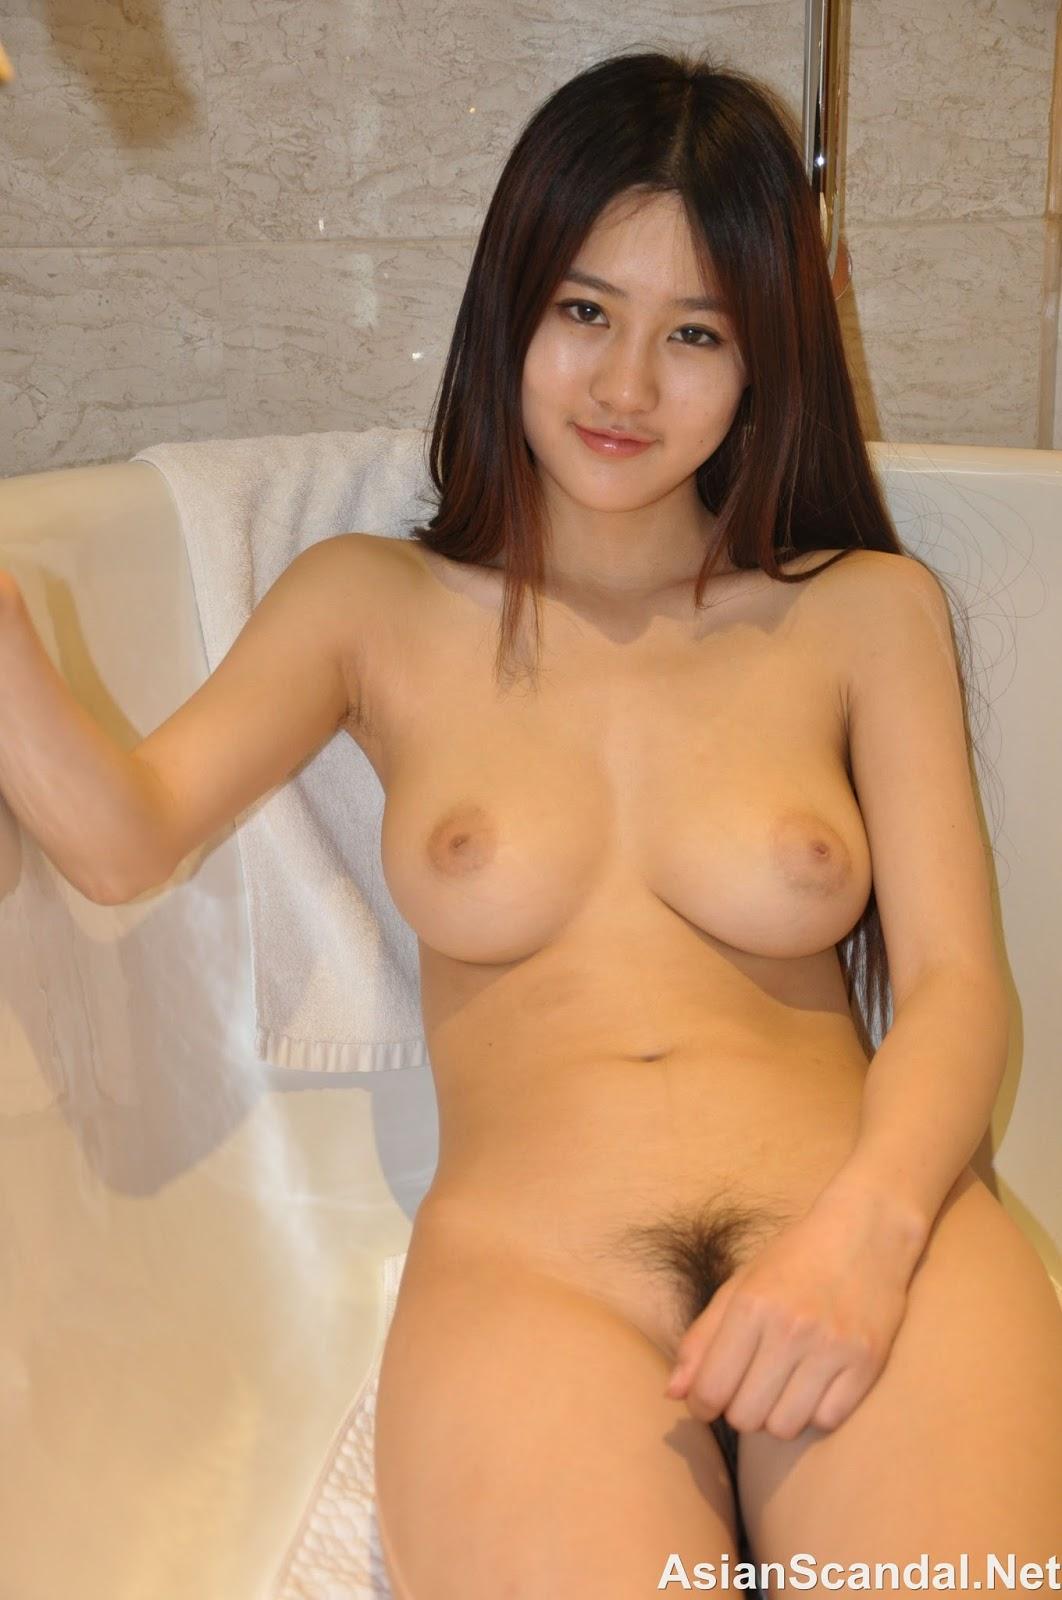 Teen korean nude pics